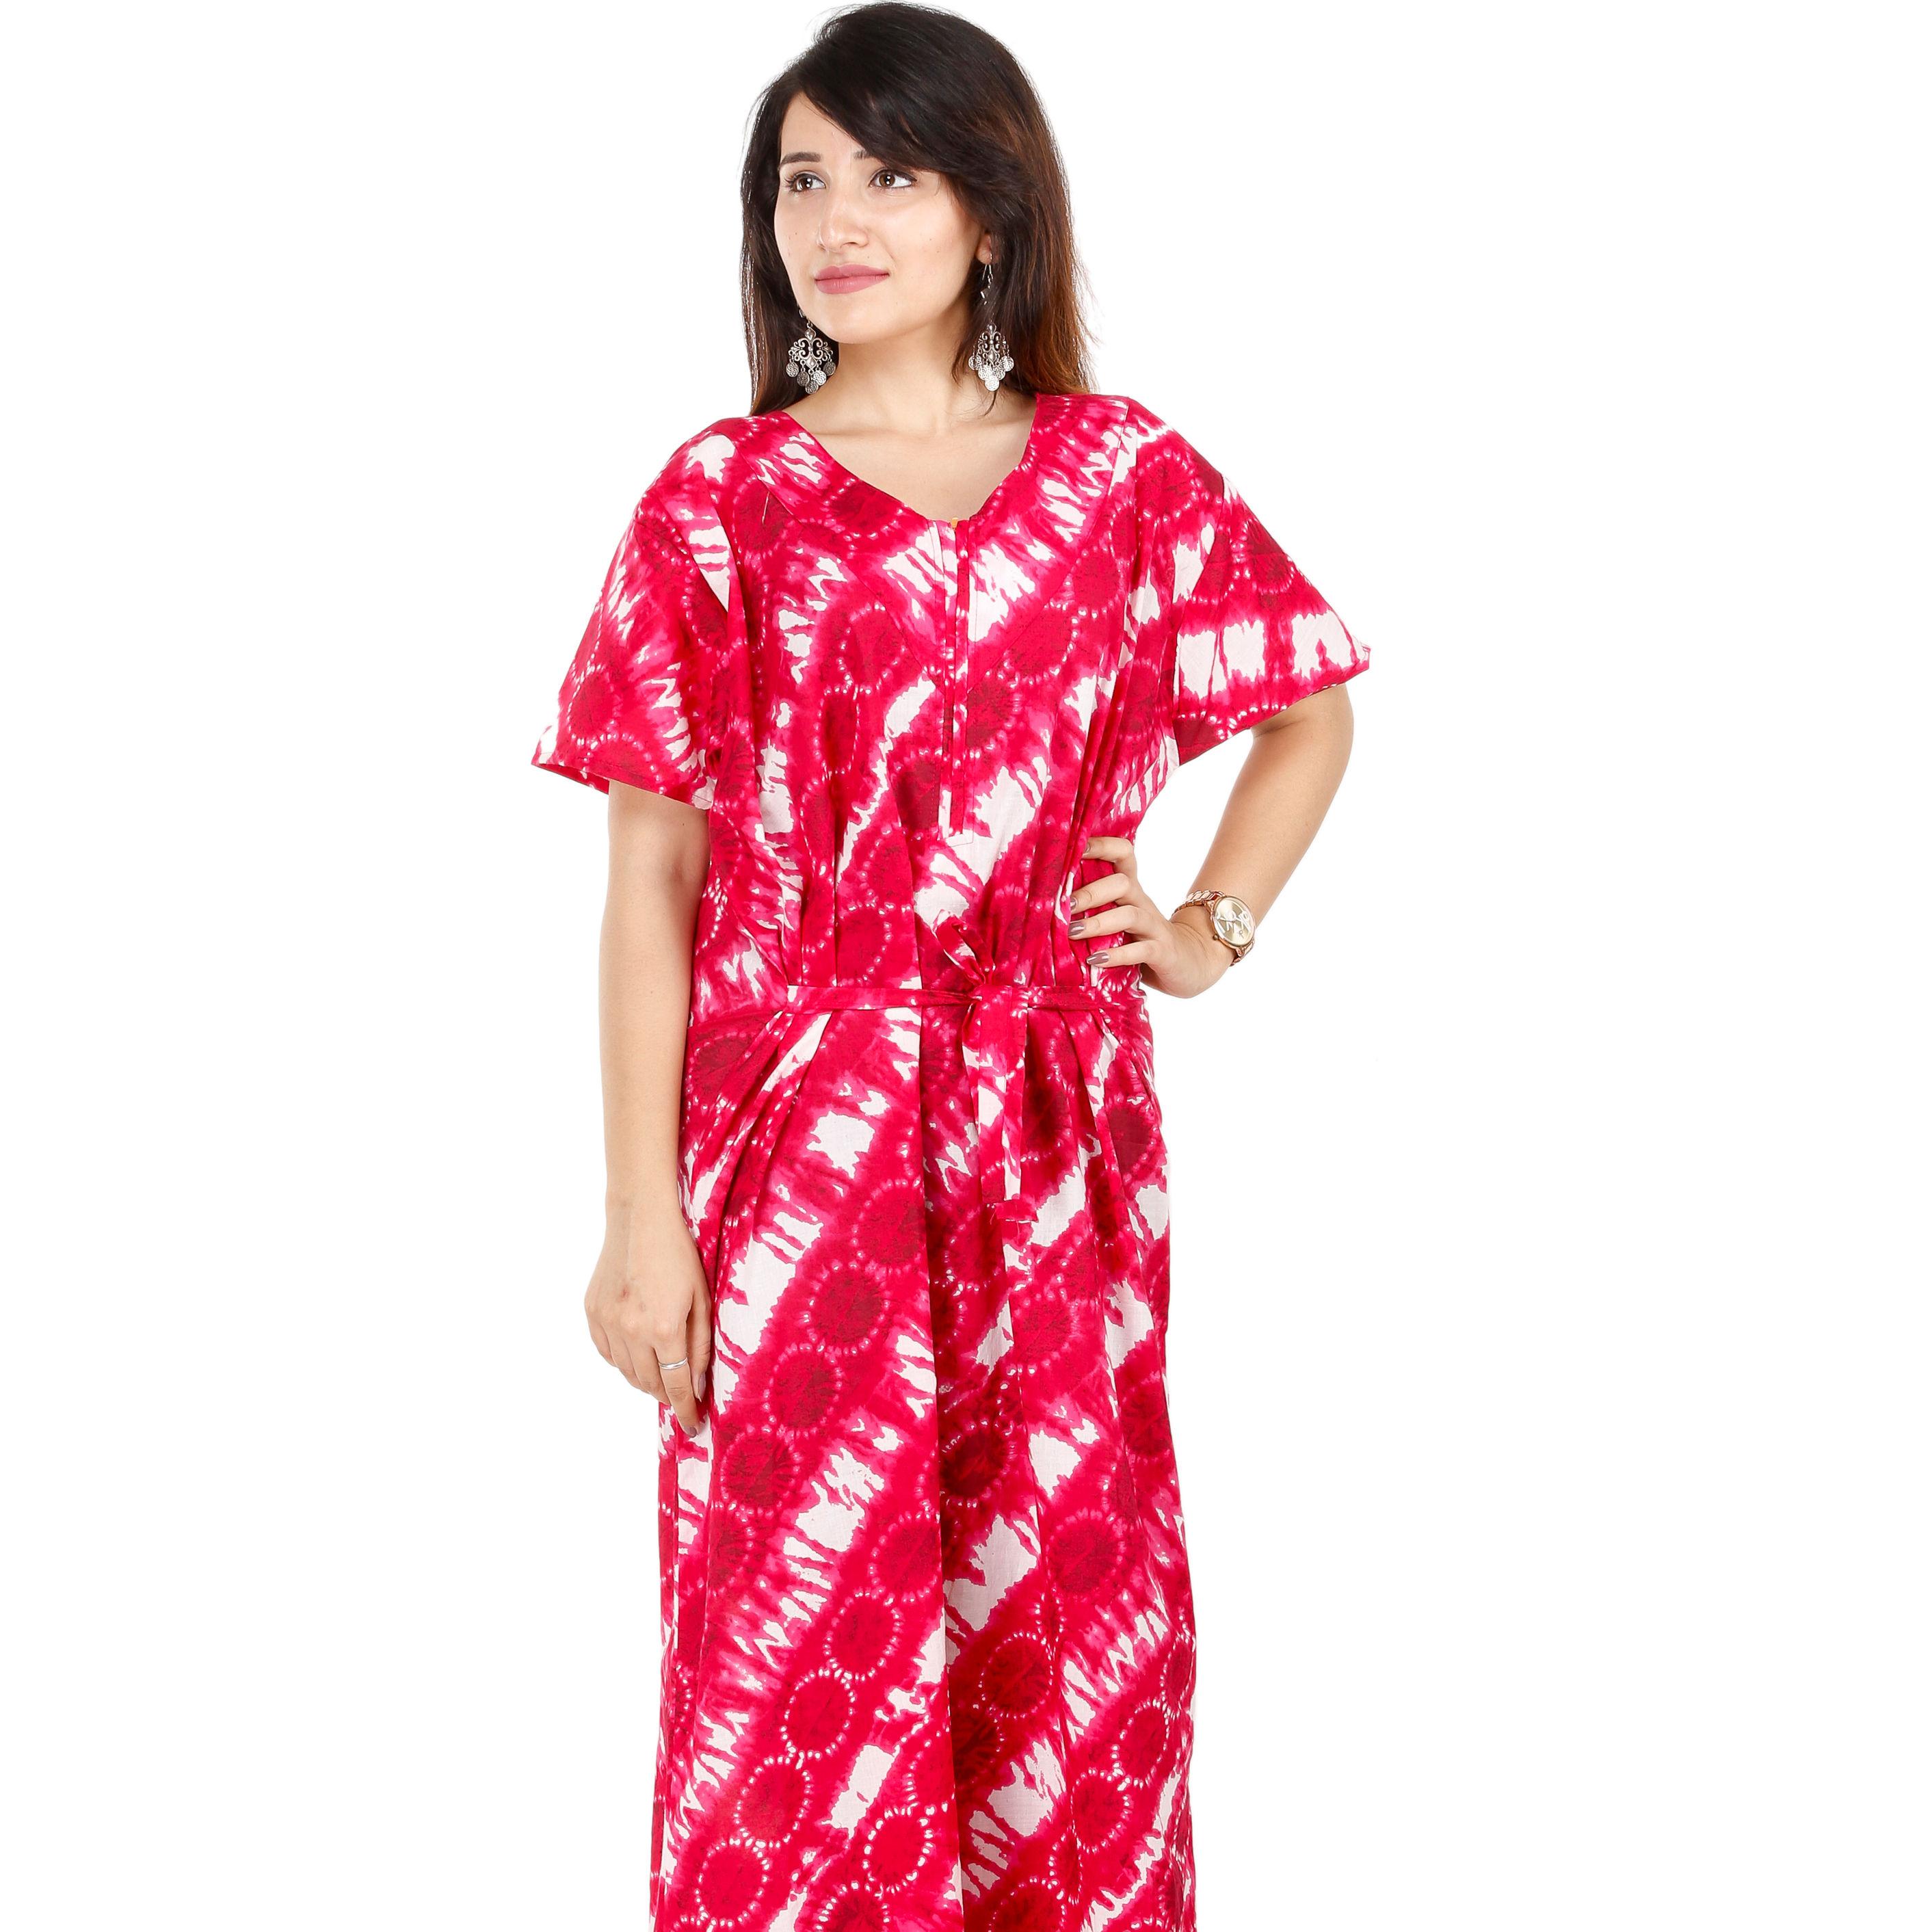 Womens Pyjamas Flower Night Wear Nighty Cotton Revere Collar Short Sleeves